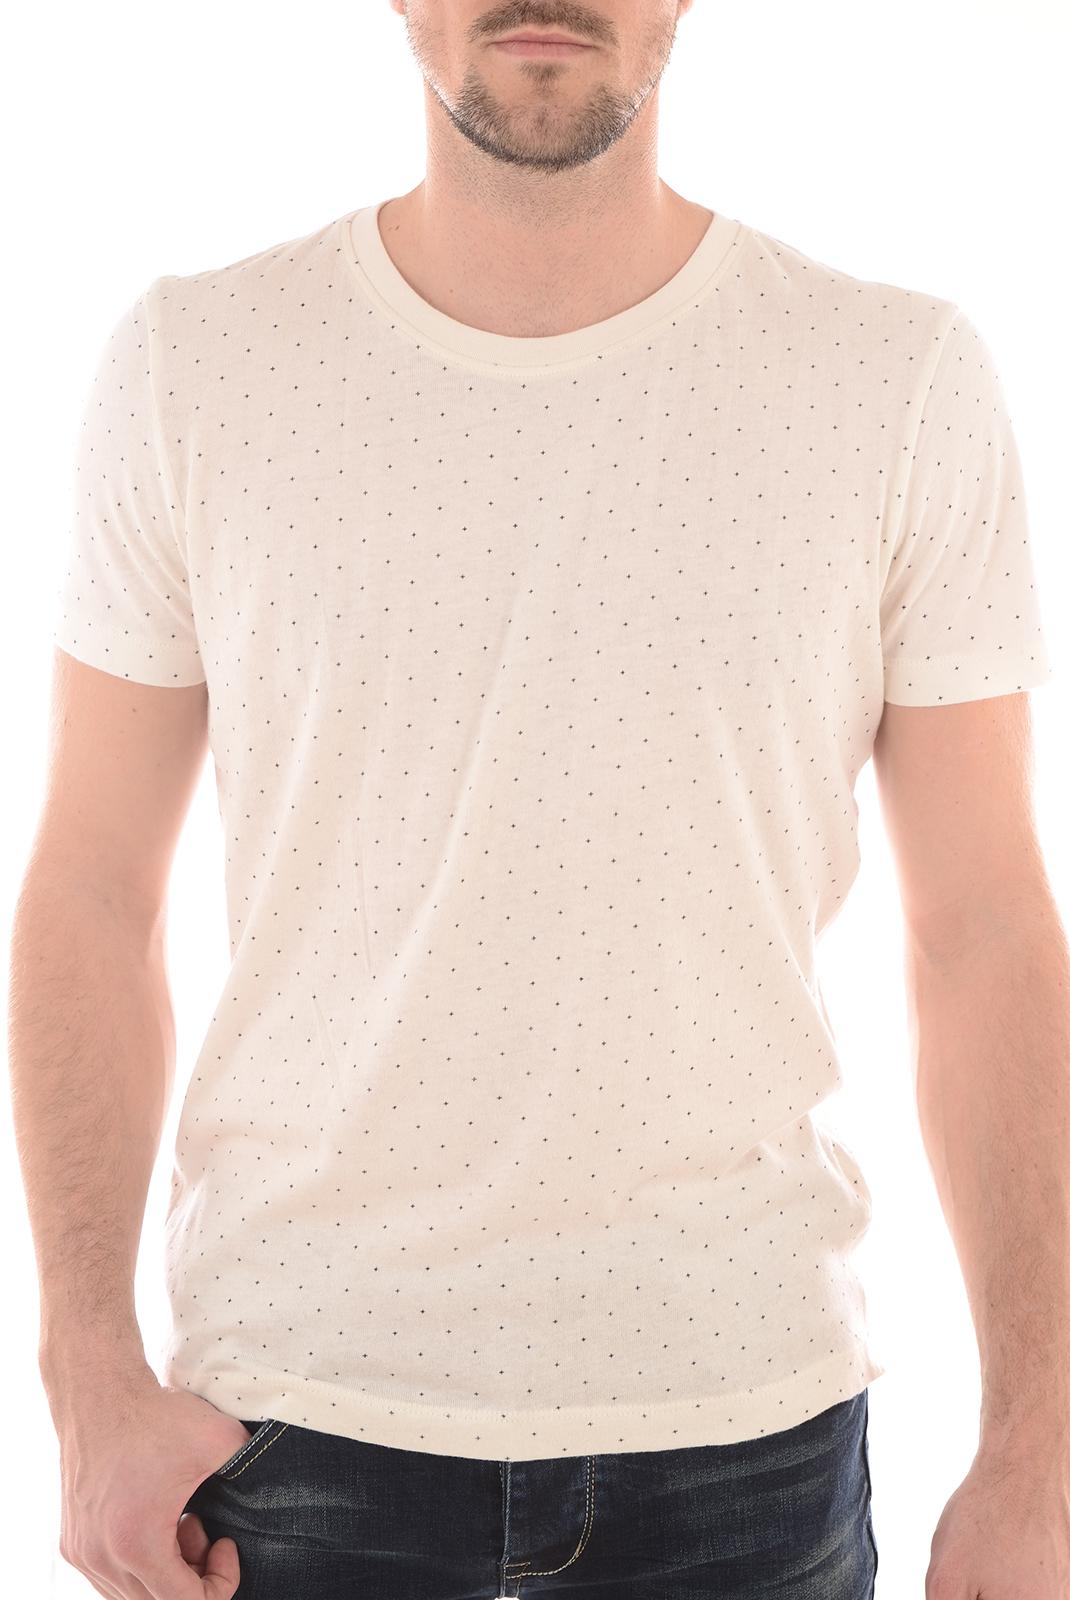 Tee-shirts  Selected LUKE SS O NECK EGRET